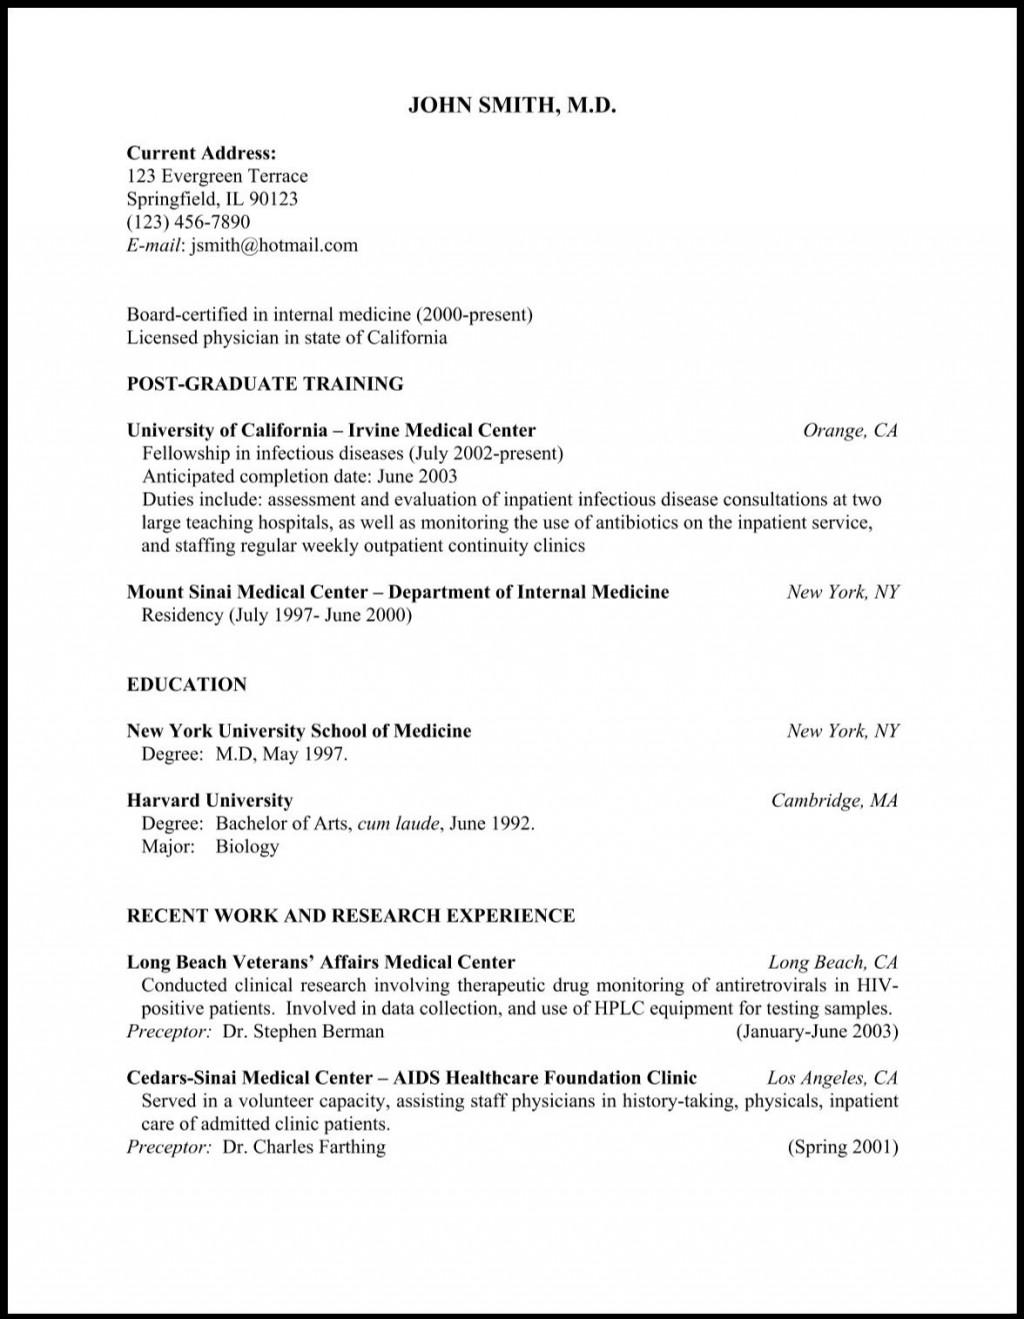 008 Dreaded Medical Curriculum Vitae Template Photo  Templates Word Sample StudentLarge